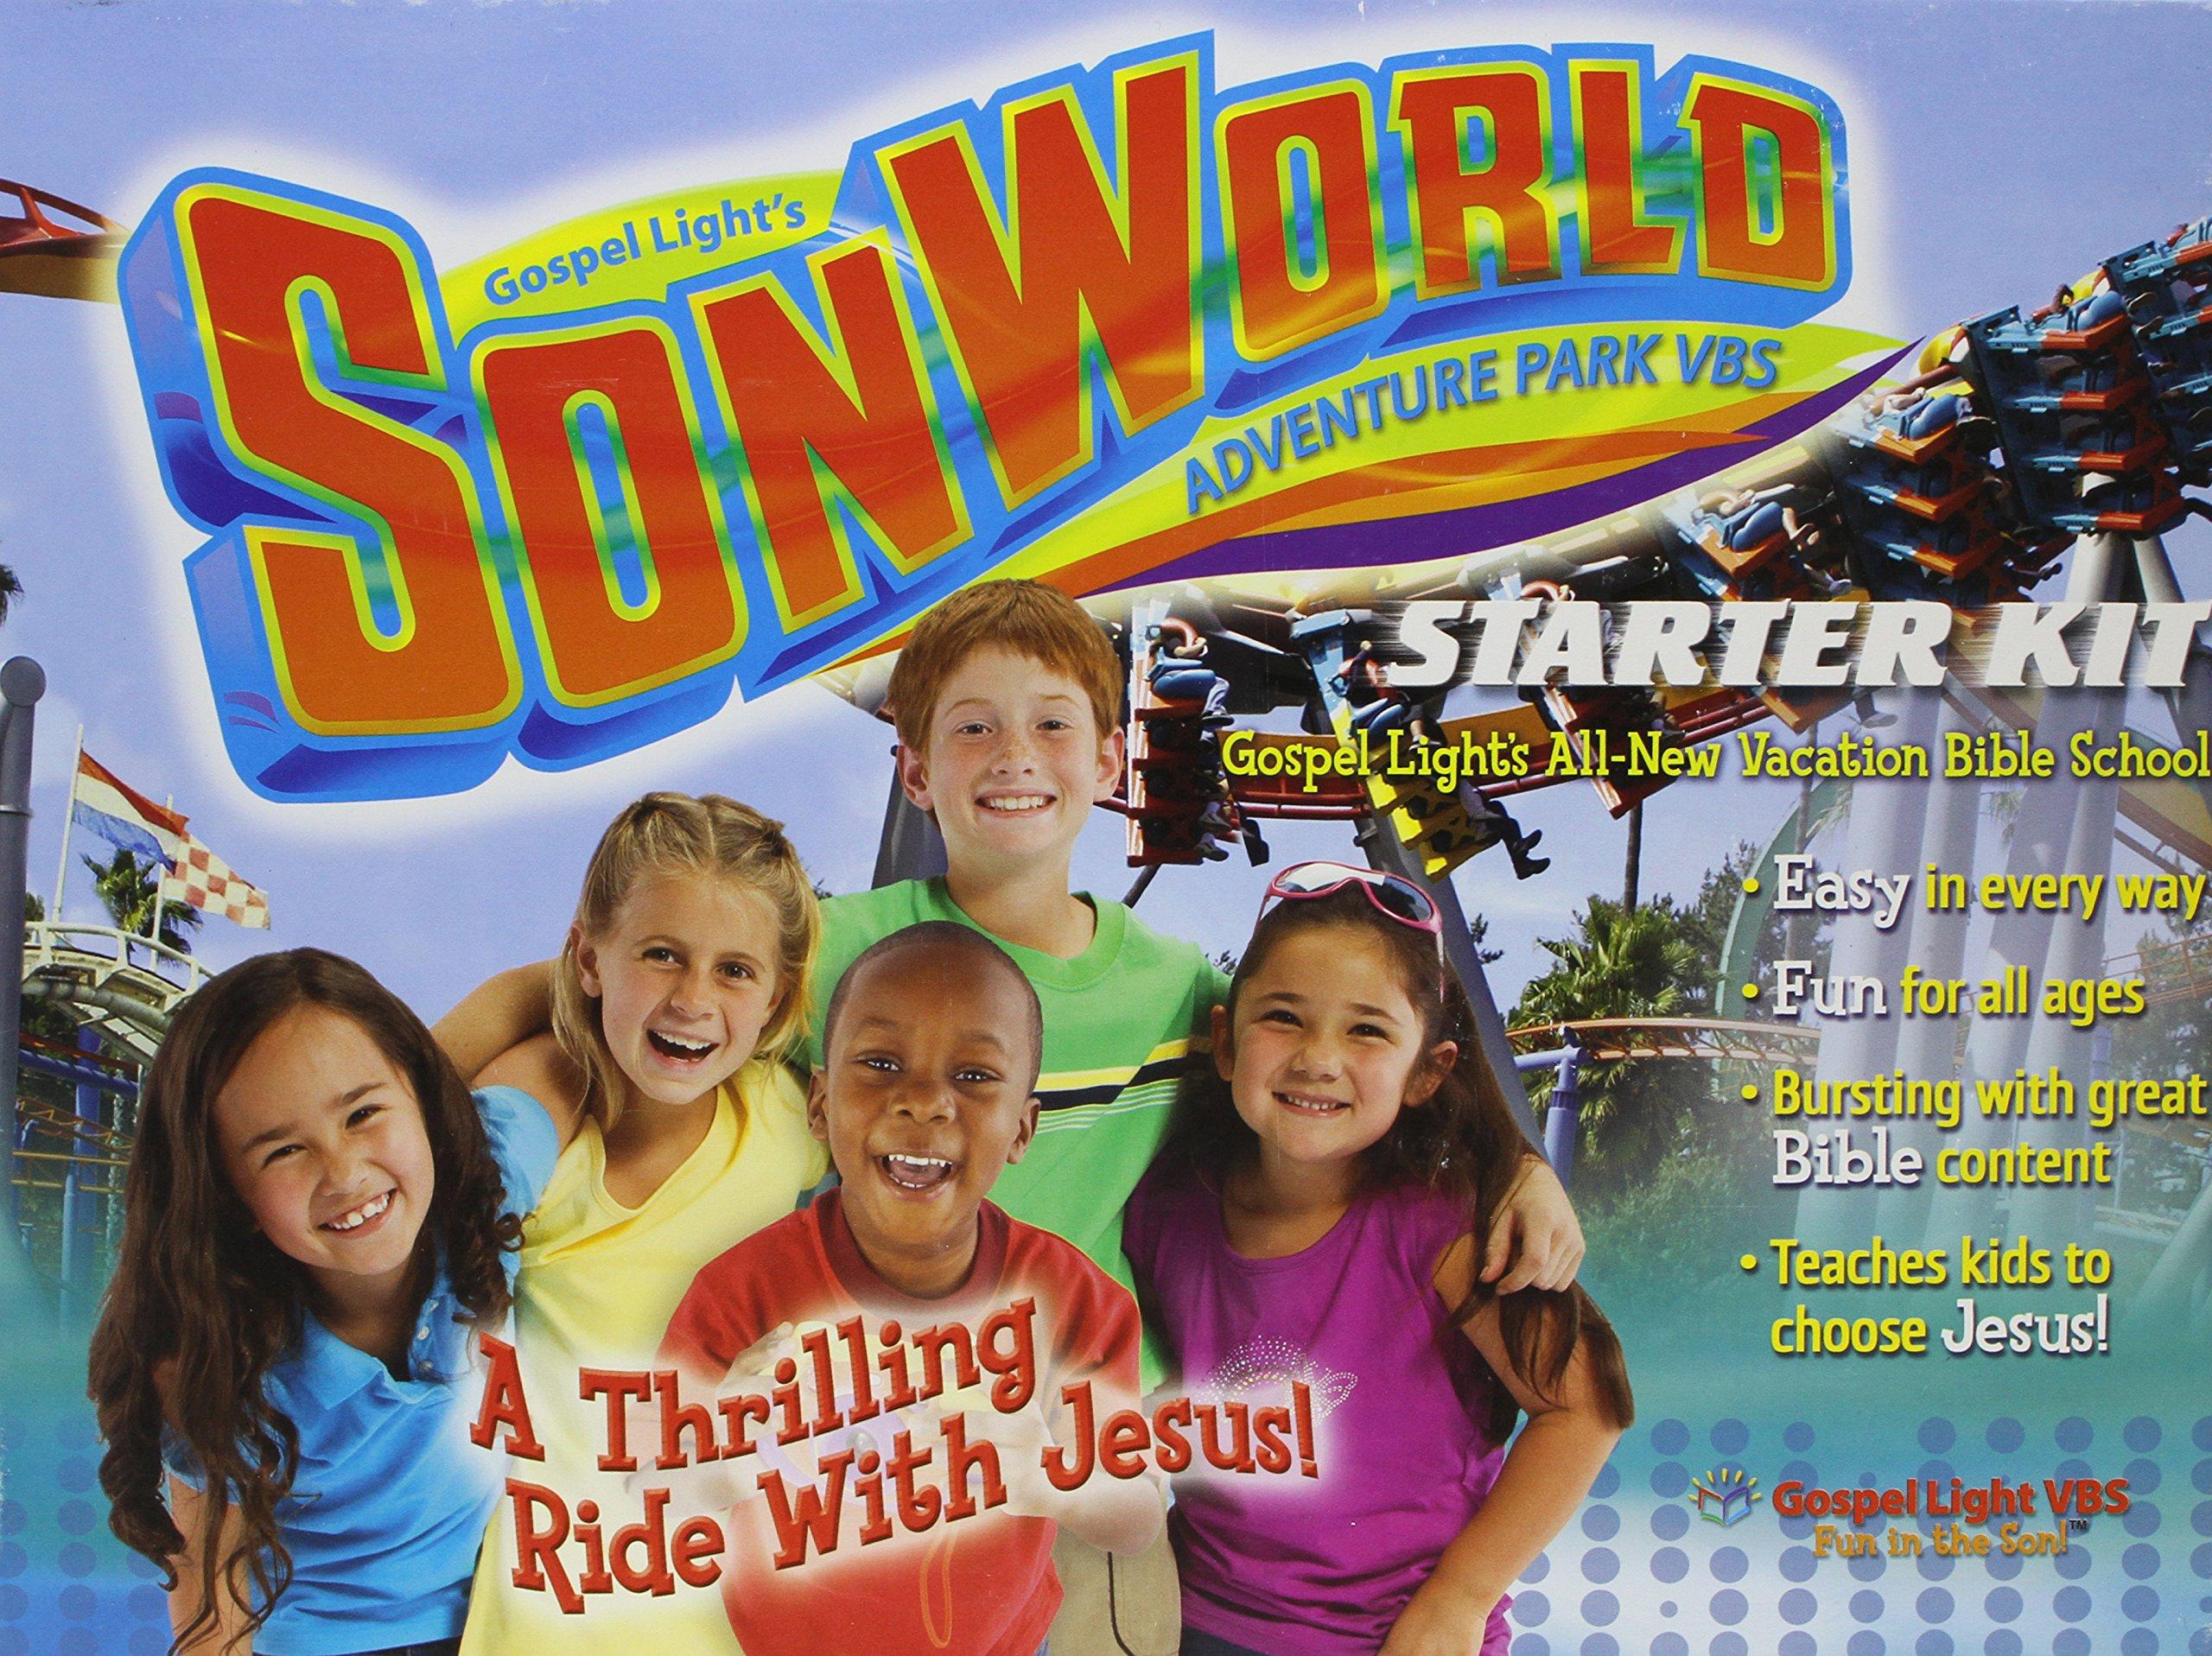 sonworld adventure park music